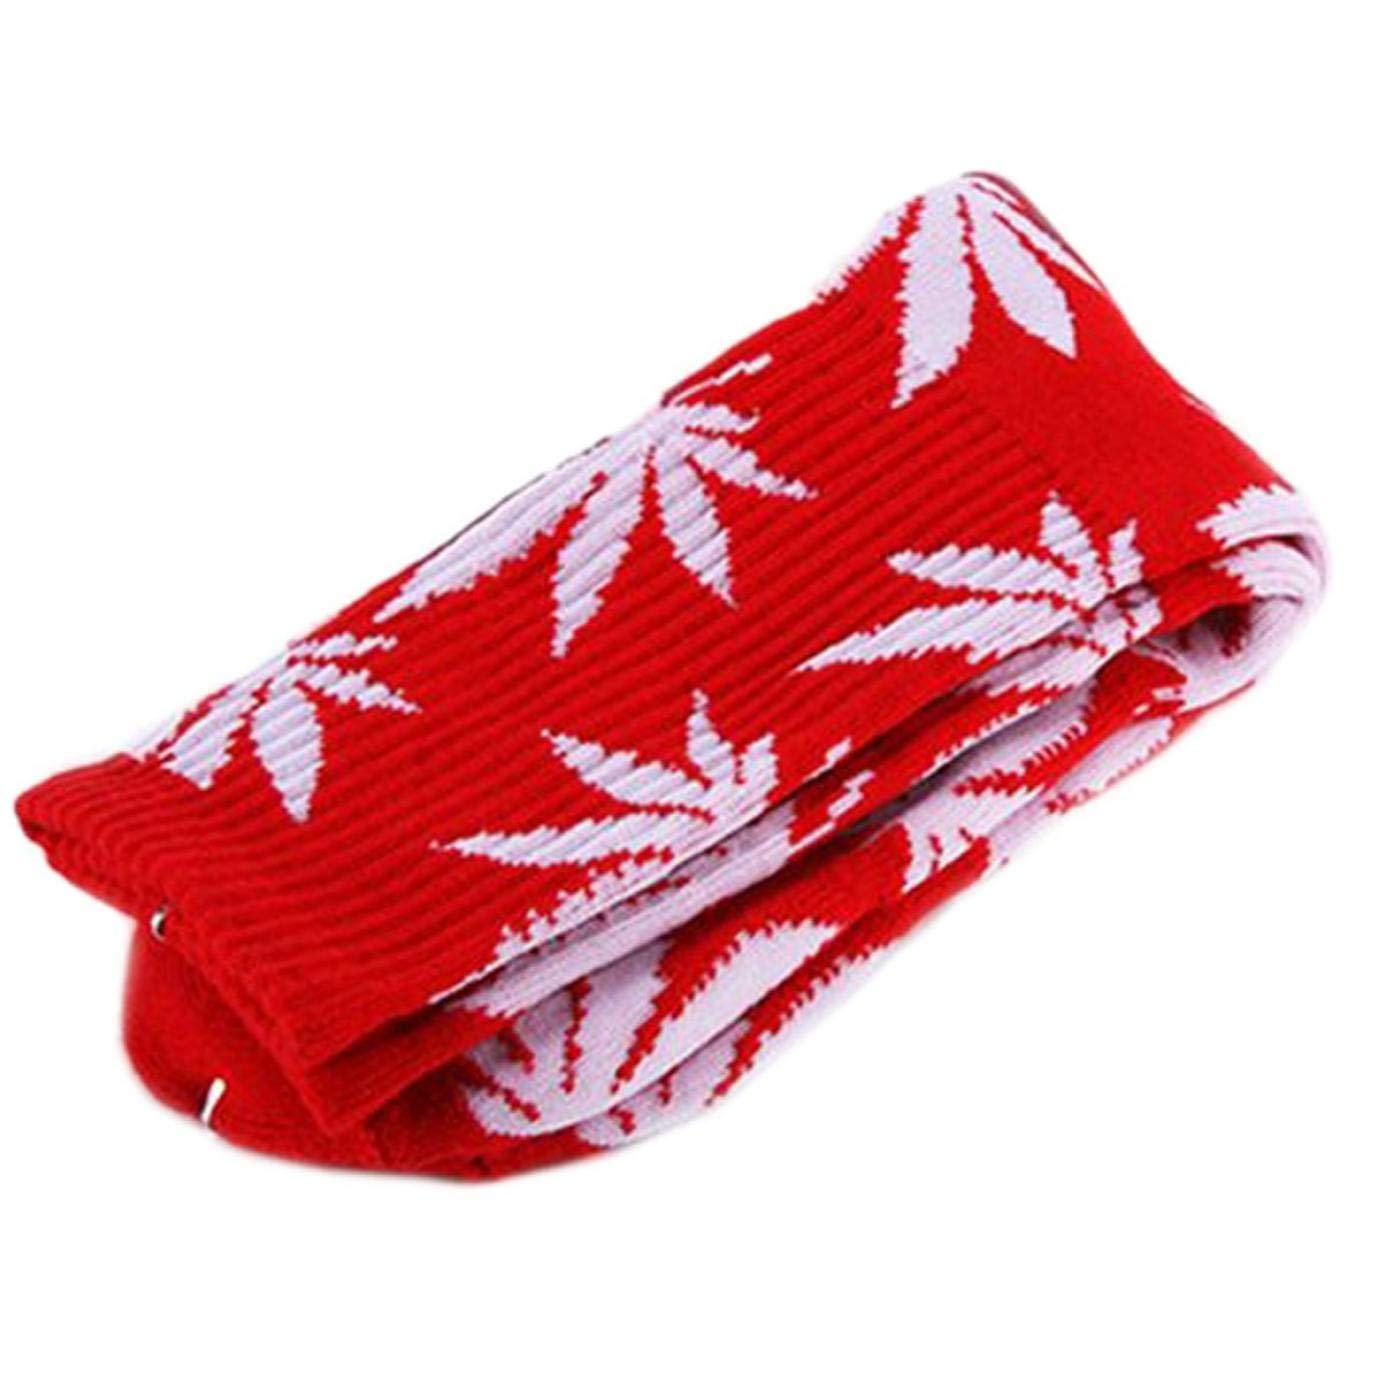 rot Gamloious Paradise Kiss 5 Farben Plantlife Marihuana Weed Leaf Baumwolle Hohe Socken Herren Damen Kn/öchel